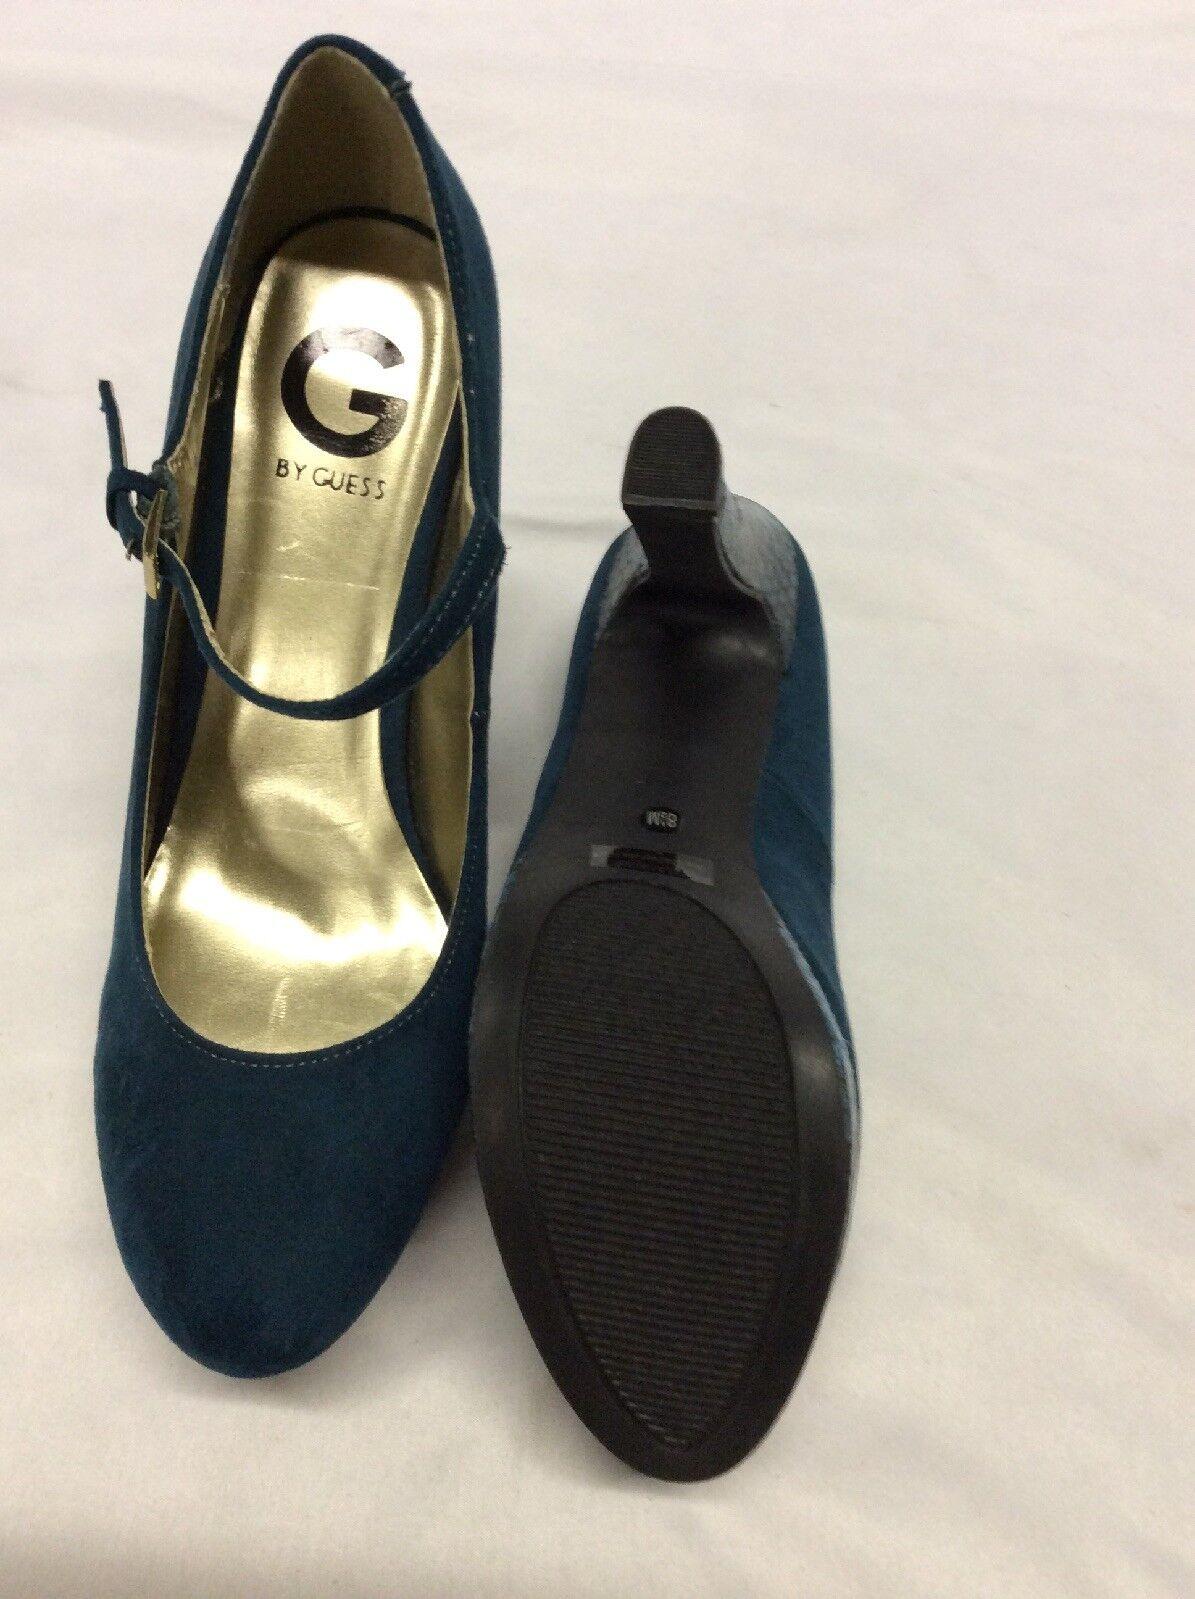 GUESS Damens's VARIKA Platform schuhe Pumps Schuhes, Turquoise ,Bridal schuhe Platform  Größe 8.5 M 081536